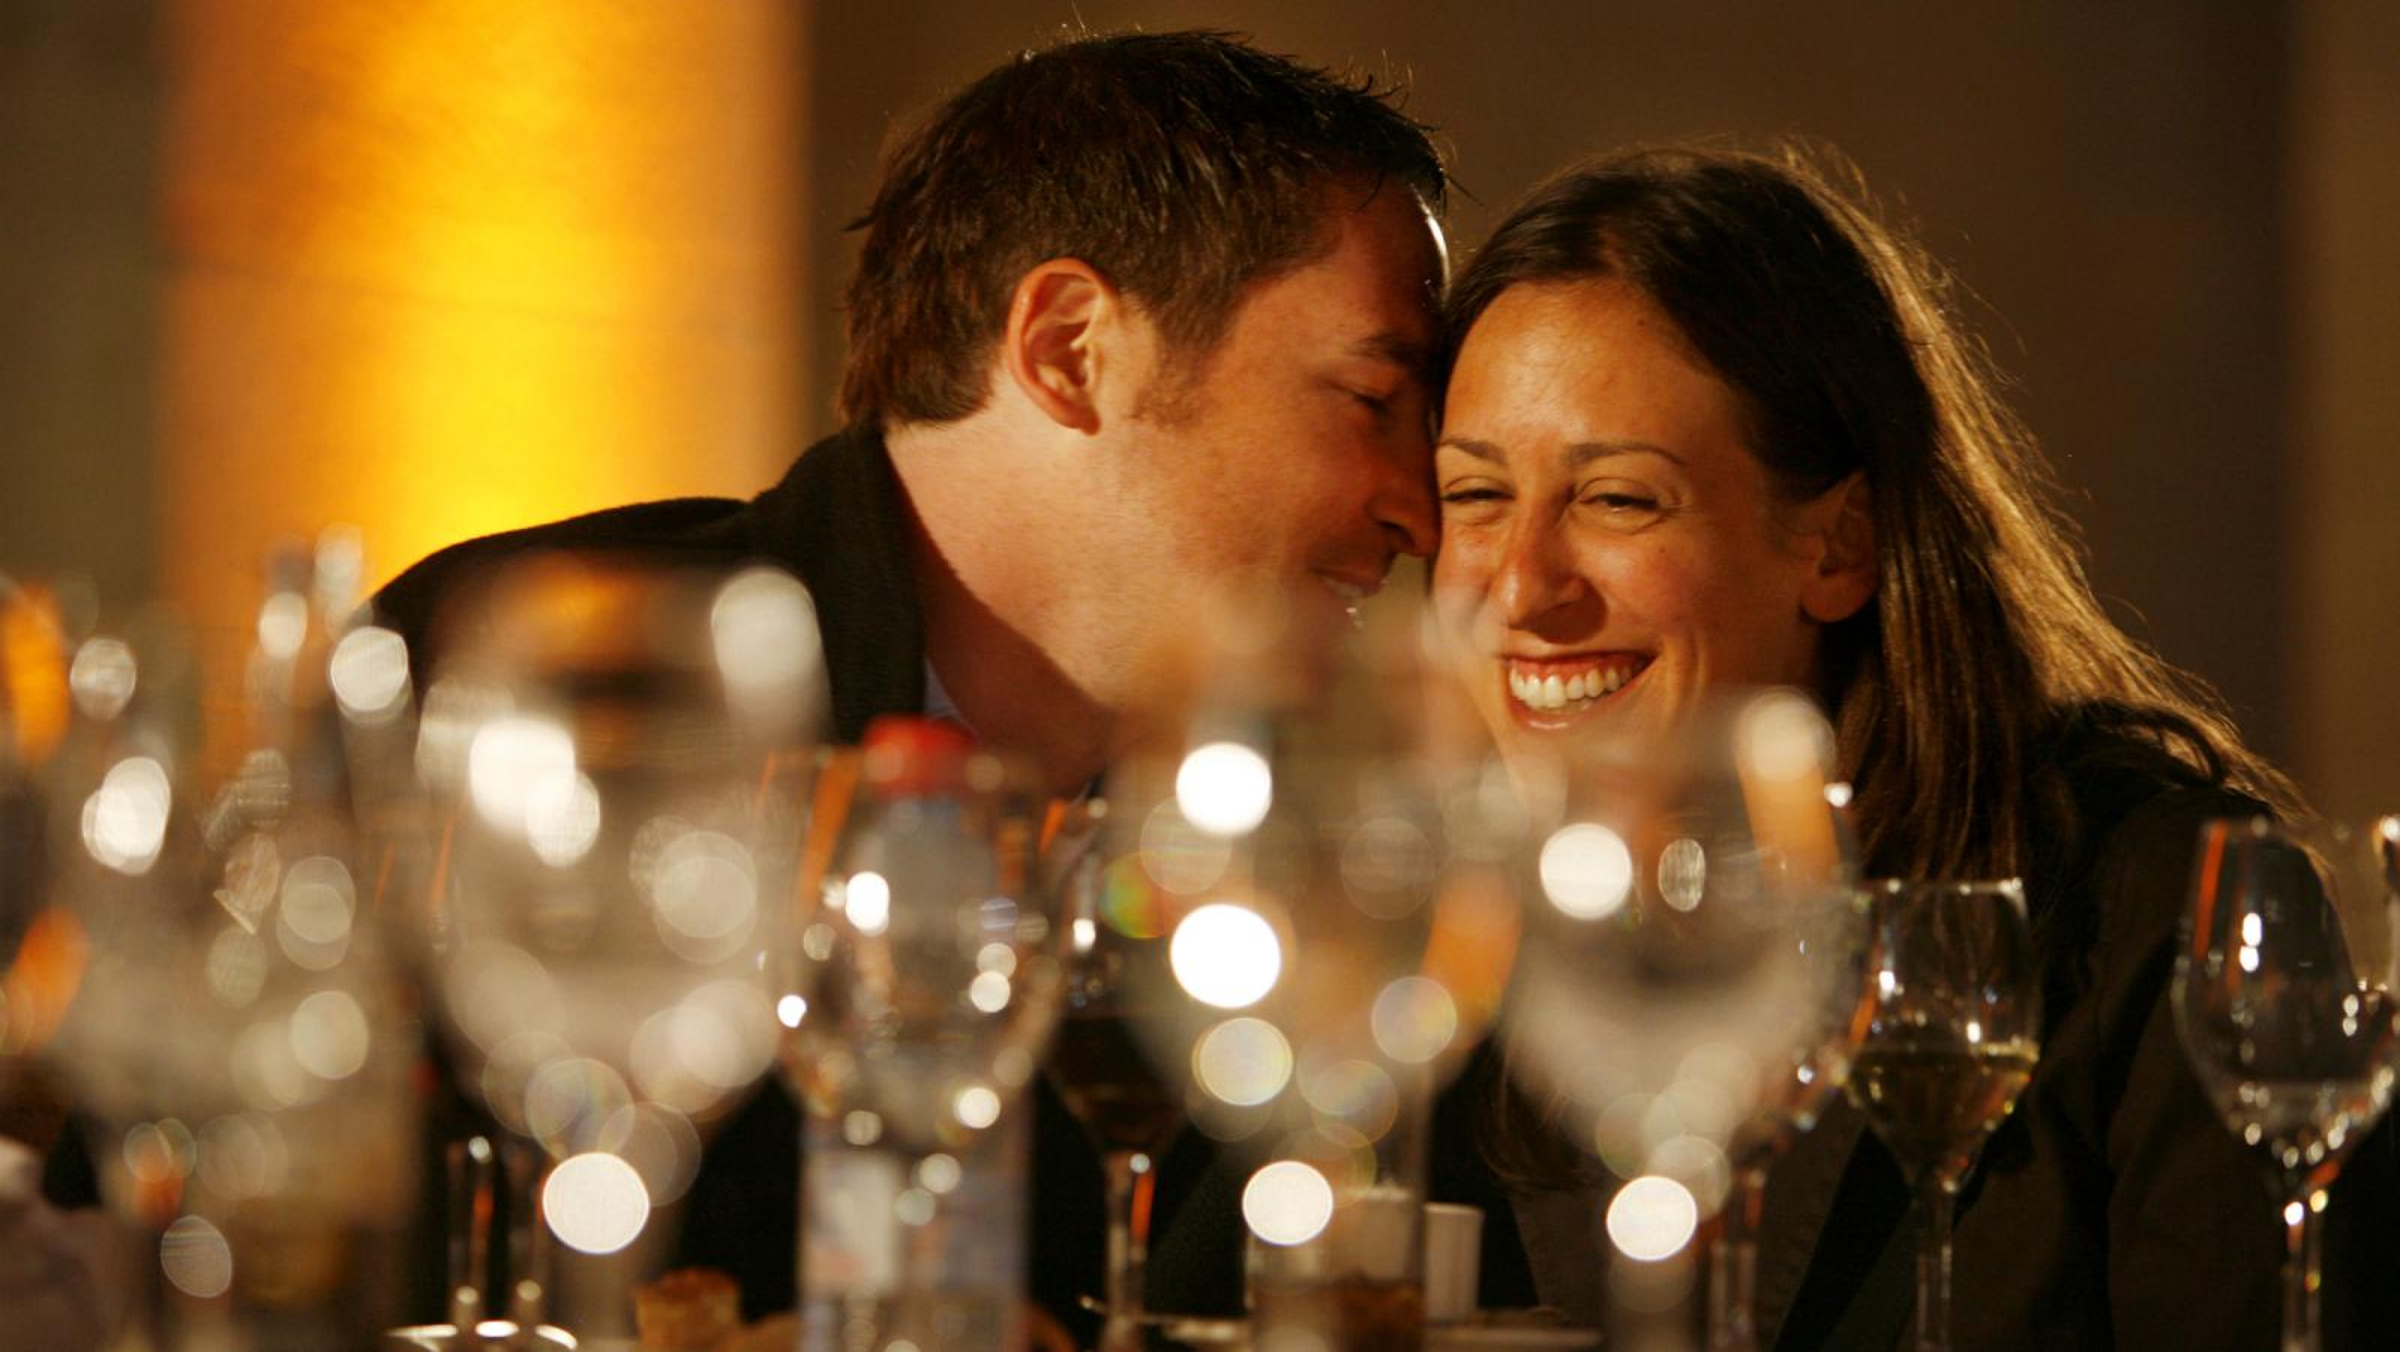 Shanghai Internet dating Mikä on paras dating site Pohjois-Irlannissa